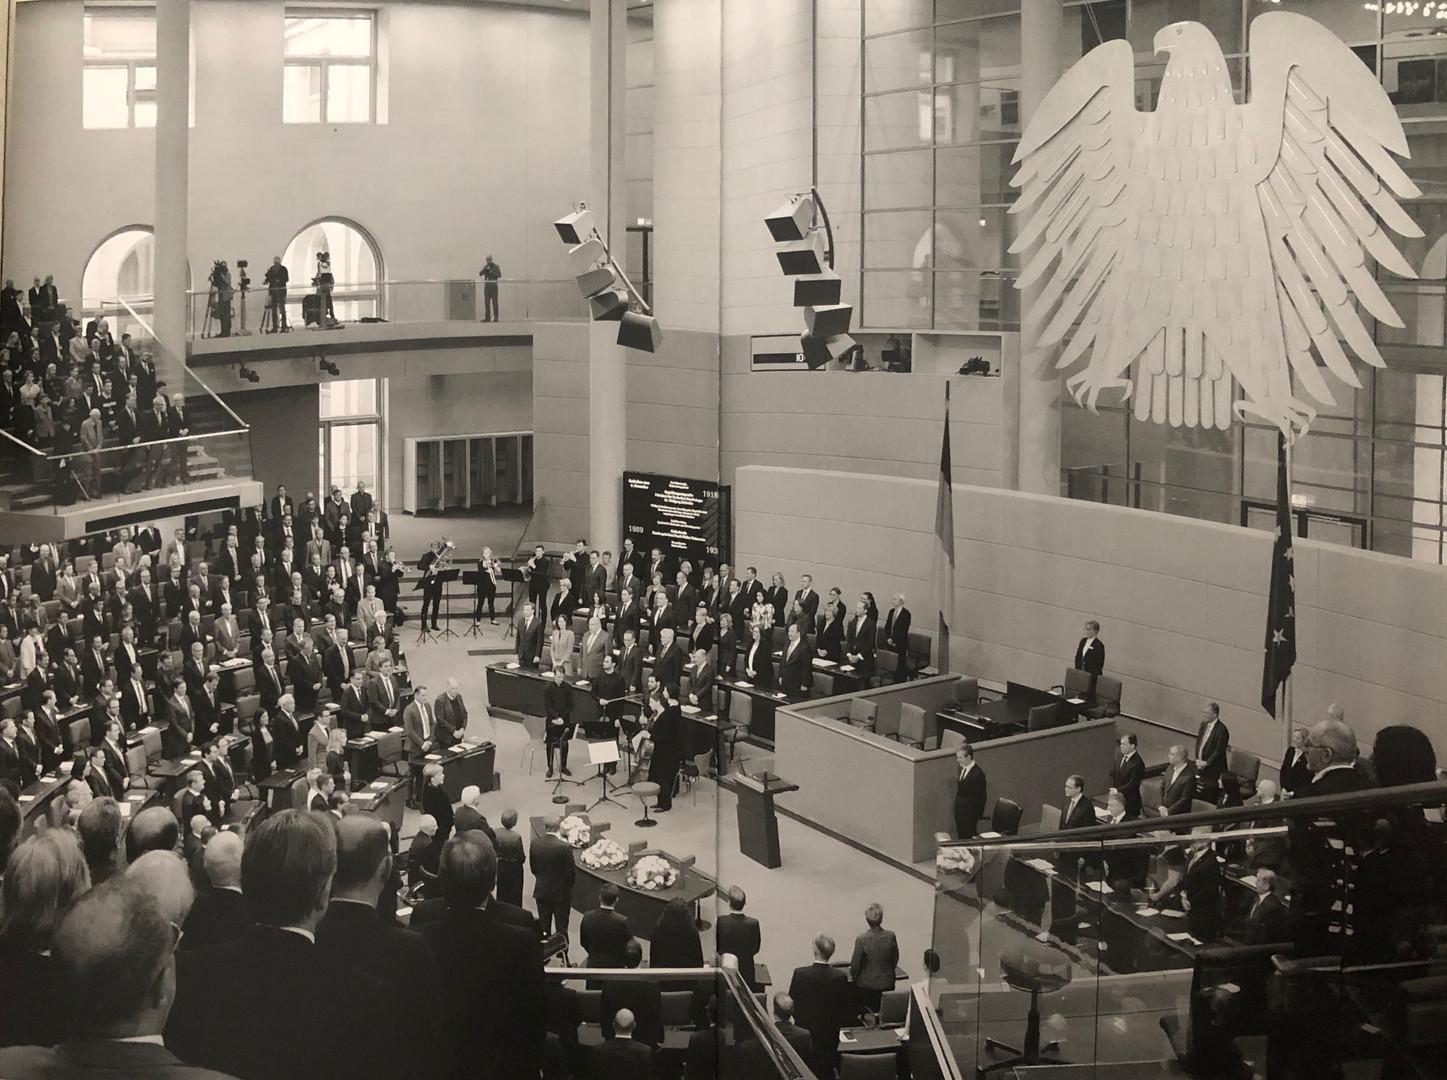 Bundestag cocnert